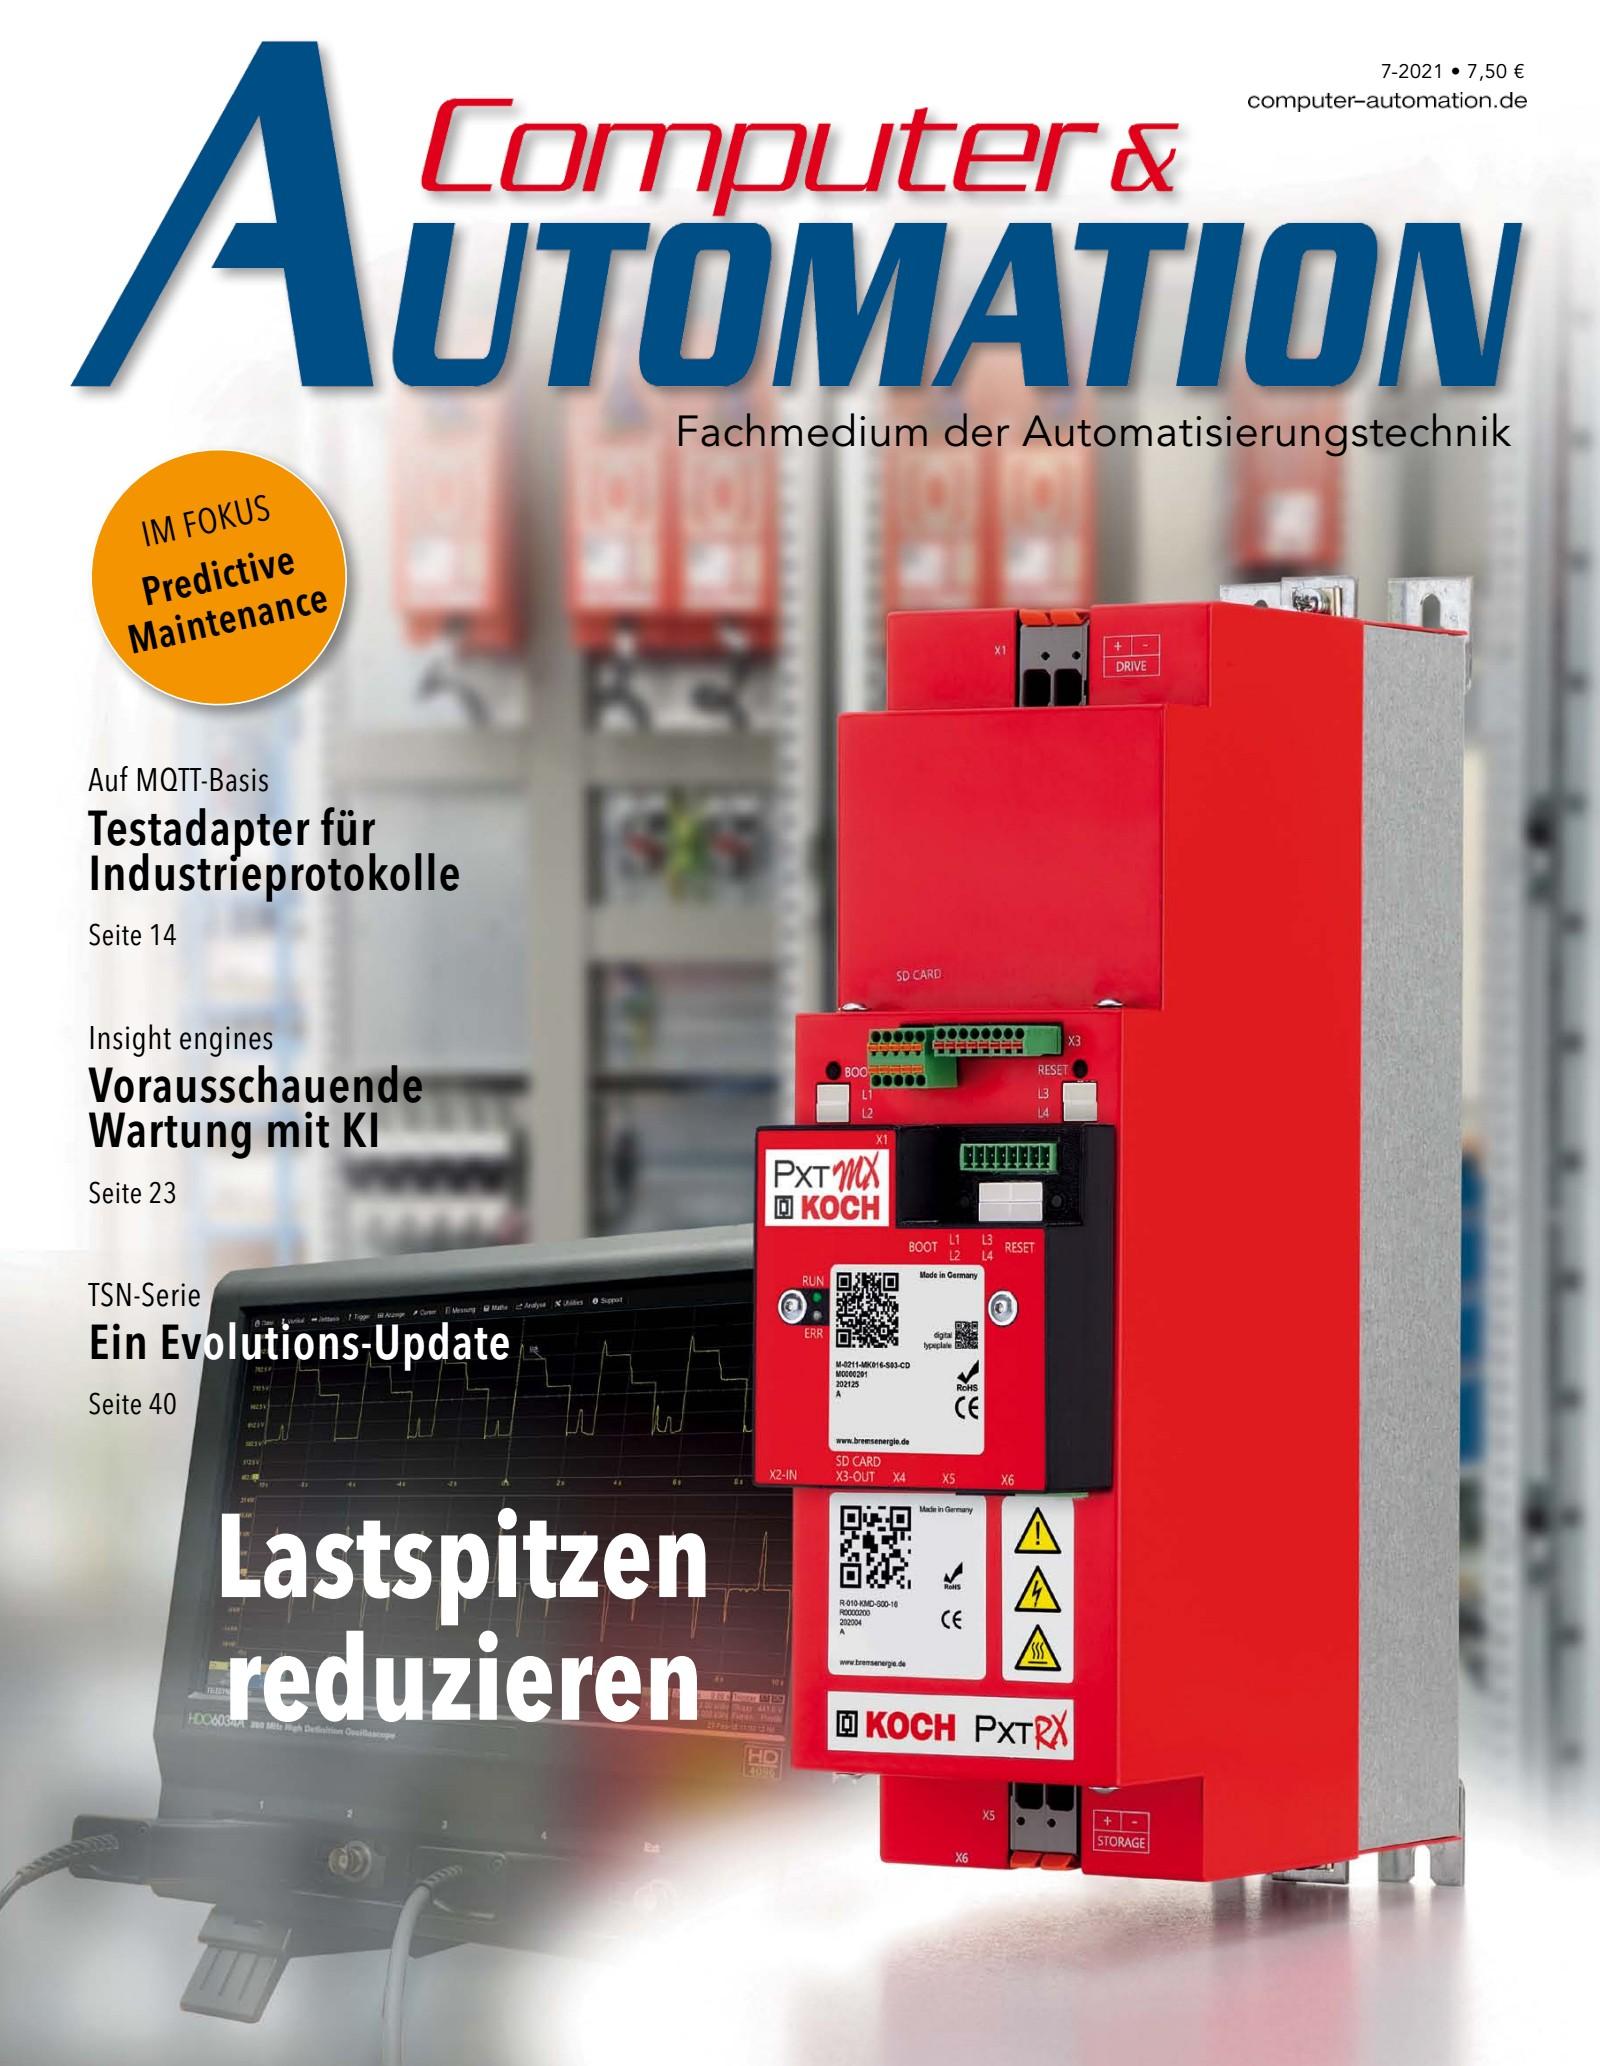 Computer&AUTOMATION 07/2021 Digital